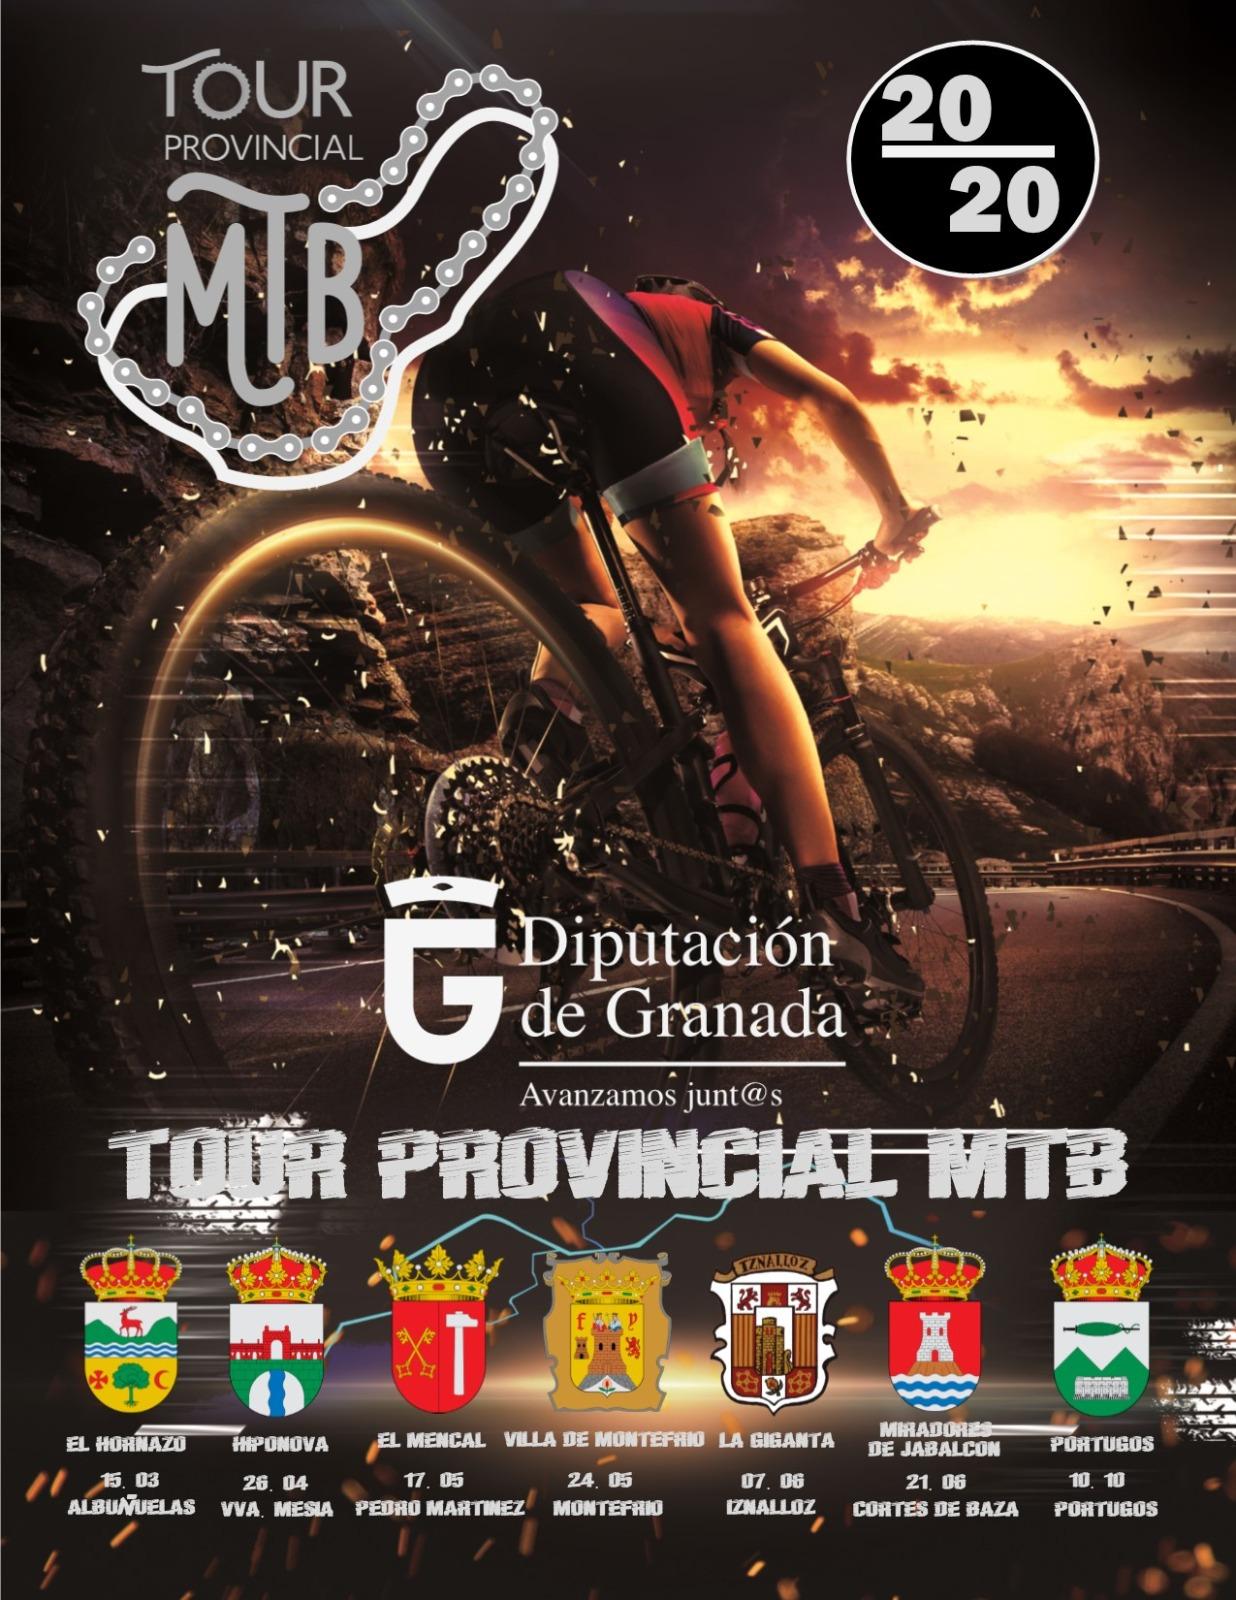 Tour Provincial MTB Diputación de Granada 2020